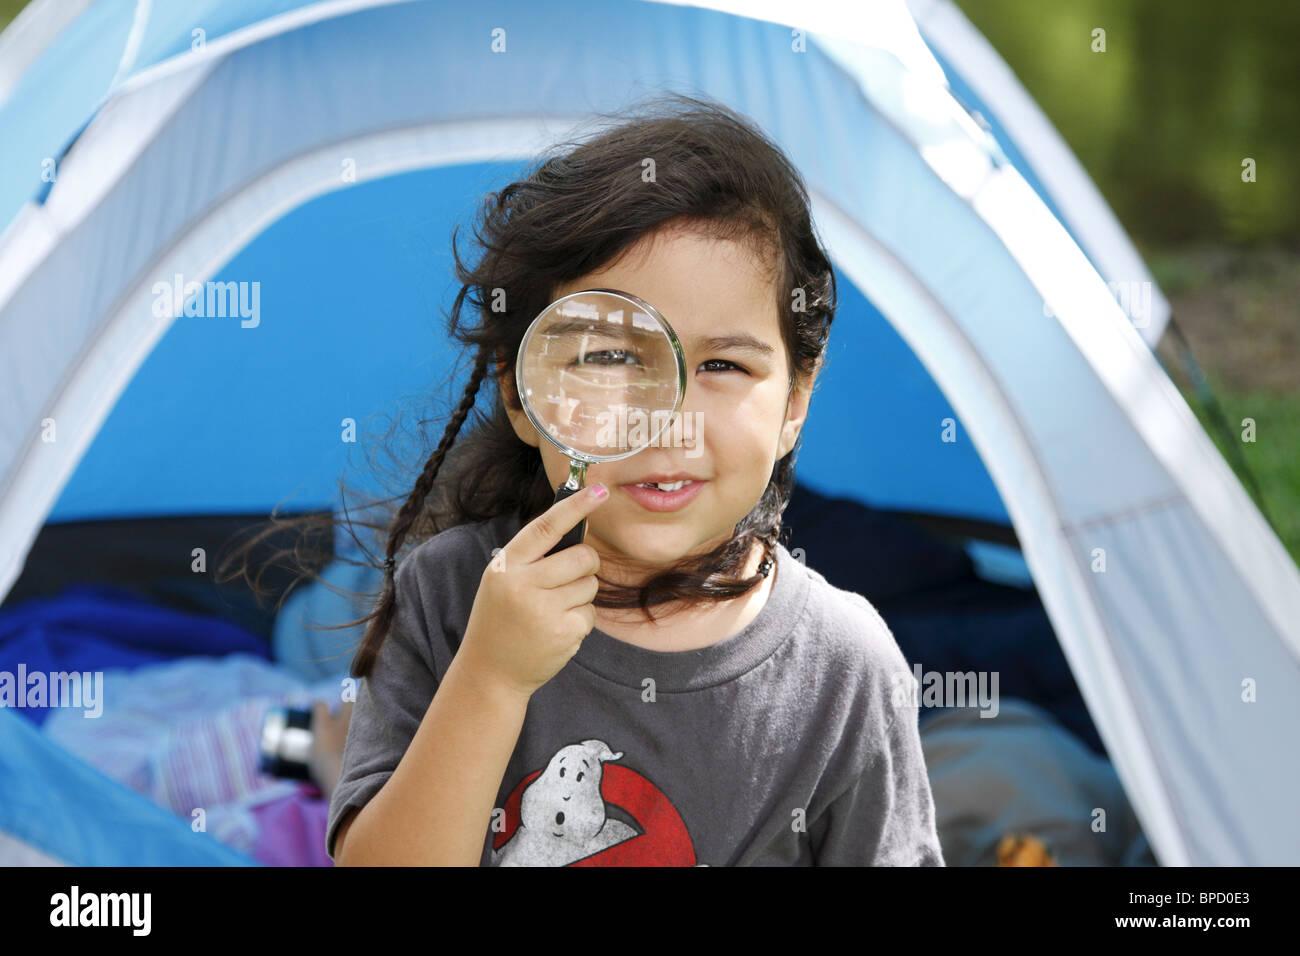 Girl looking at camera through magnifying glass - Stock Image